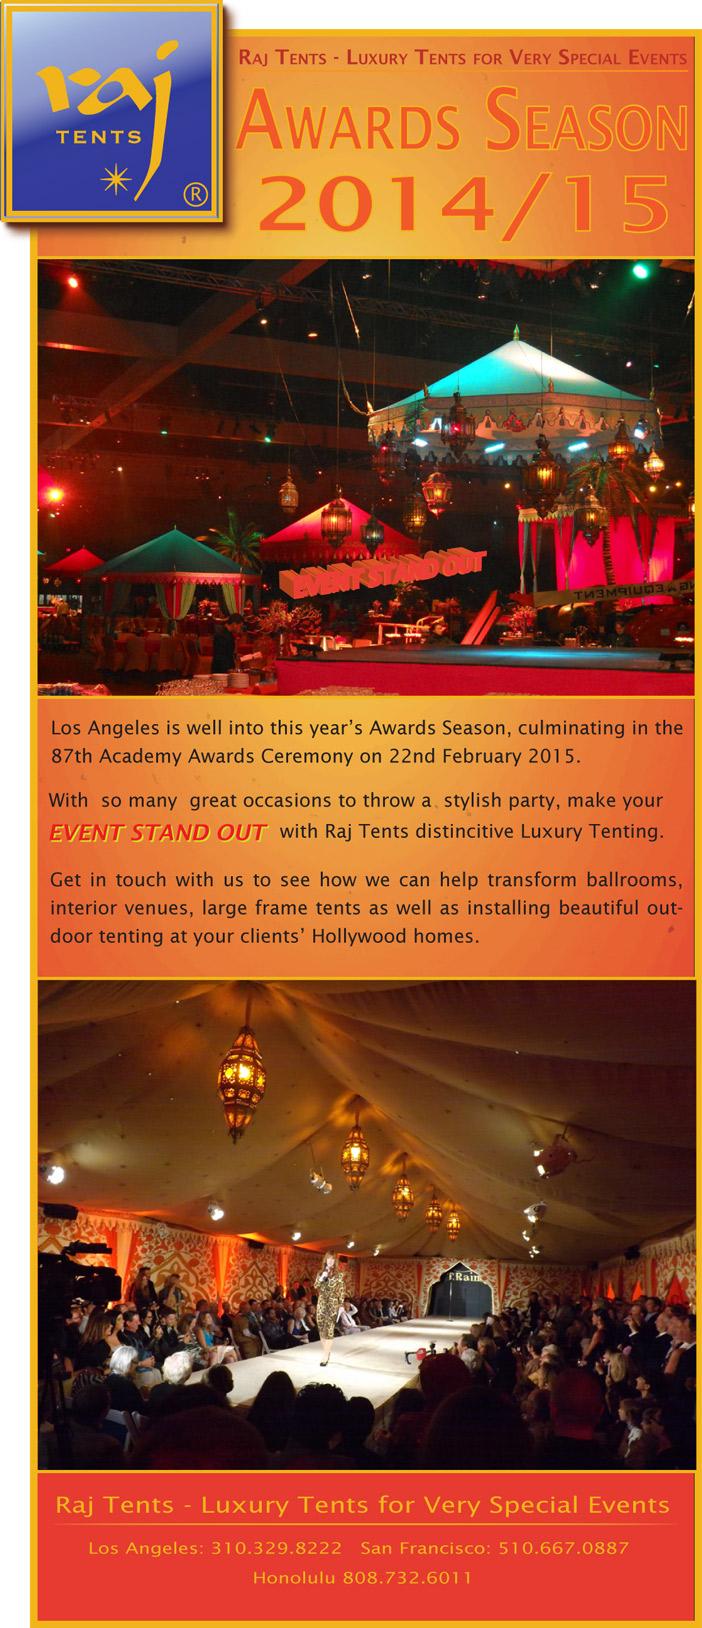 Raj-Tents-Awards-Season-2014-15.jpg